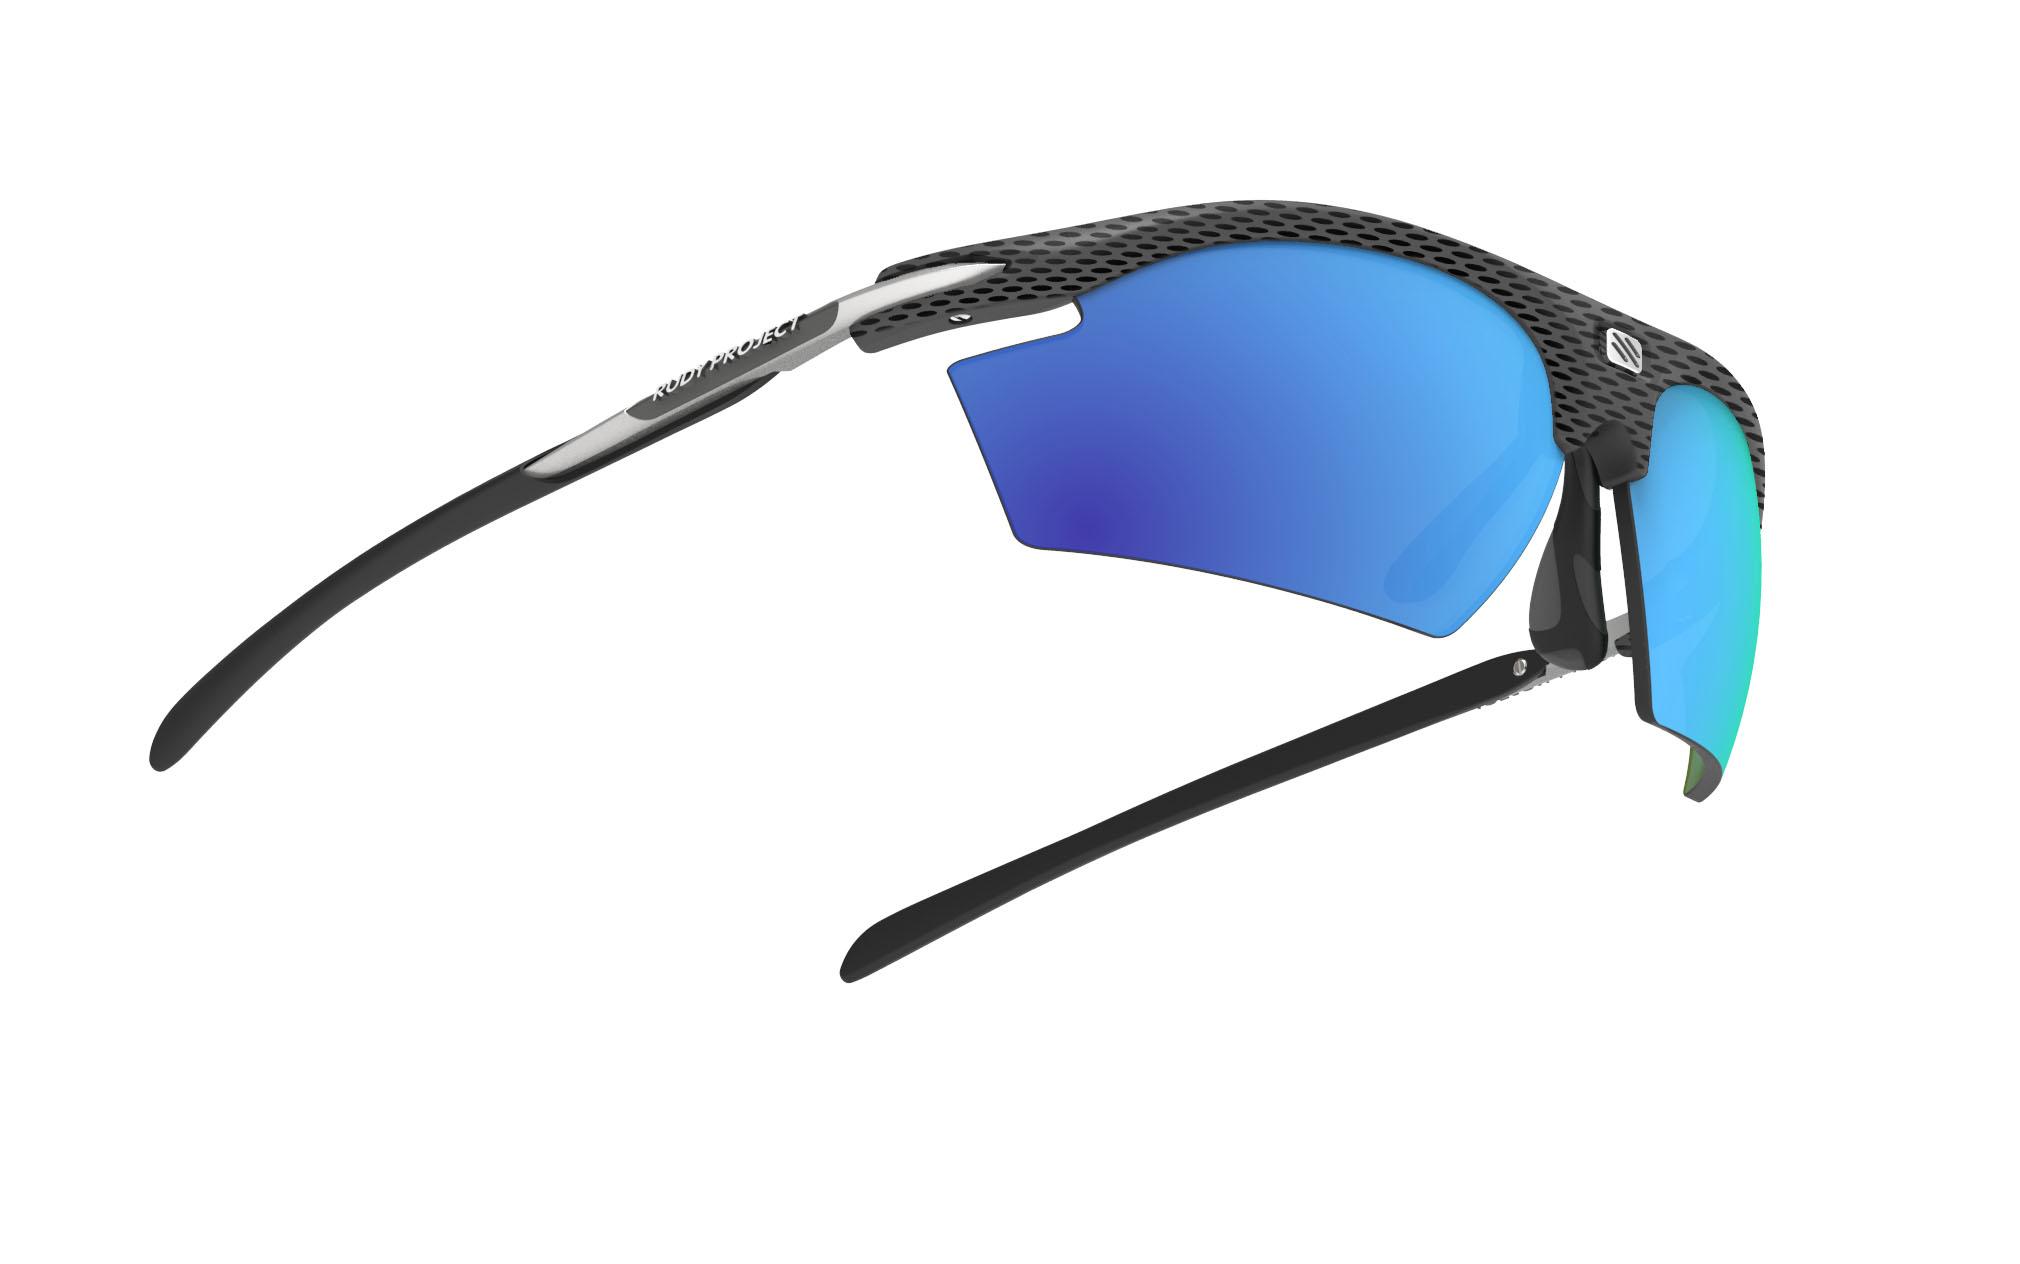 81d77af745e8d Rudy Project RYDON. RYDON Sunglasses. 1 of 7. It ...